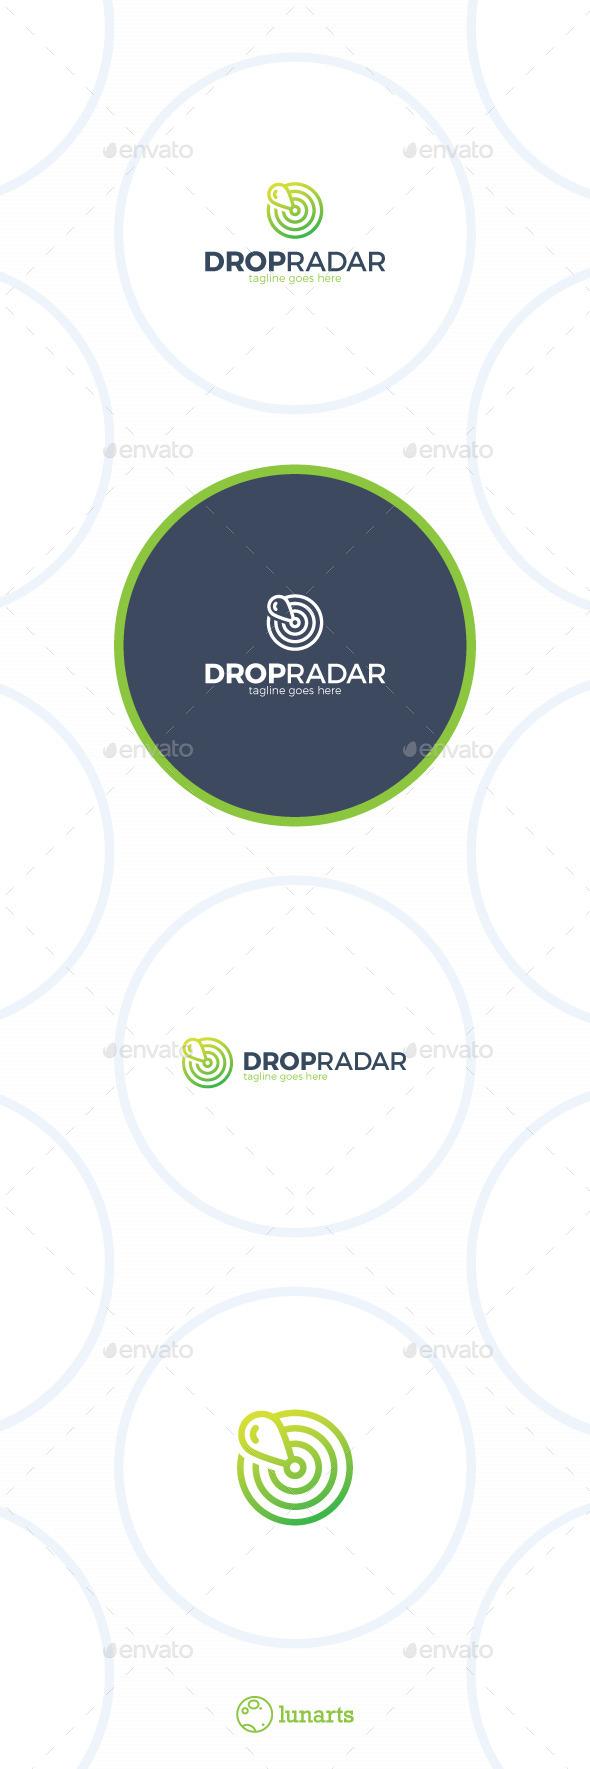 Water Drop Sonar Logo - Marker Radar - Symbols Logo Templates